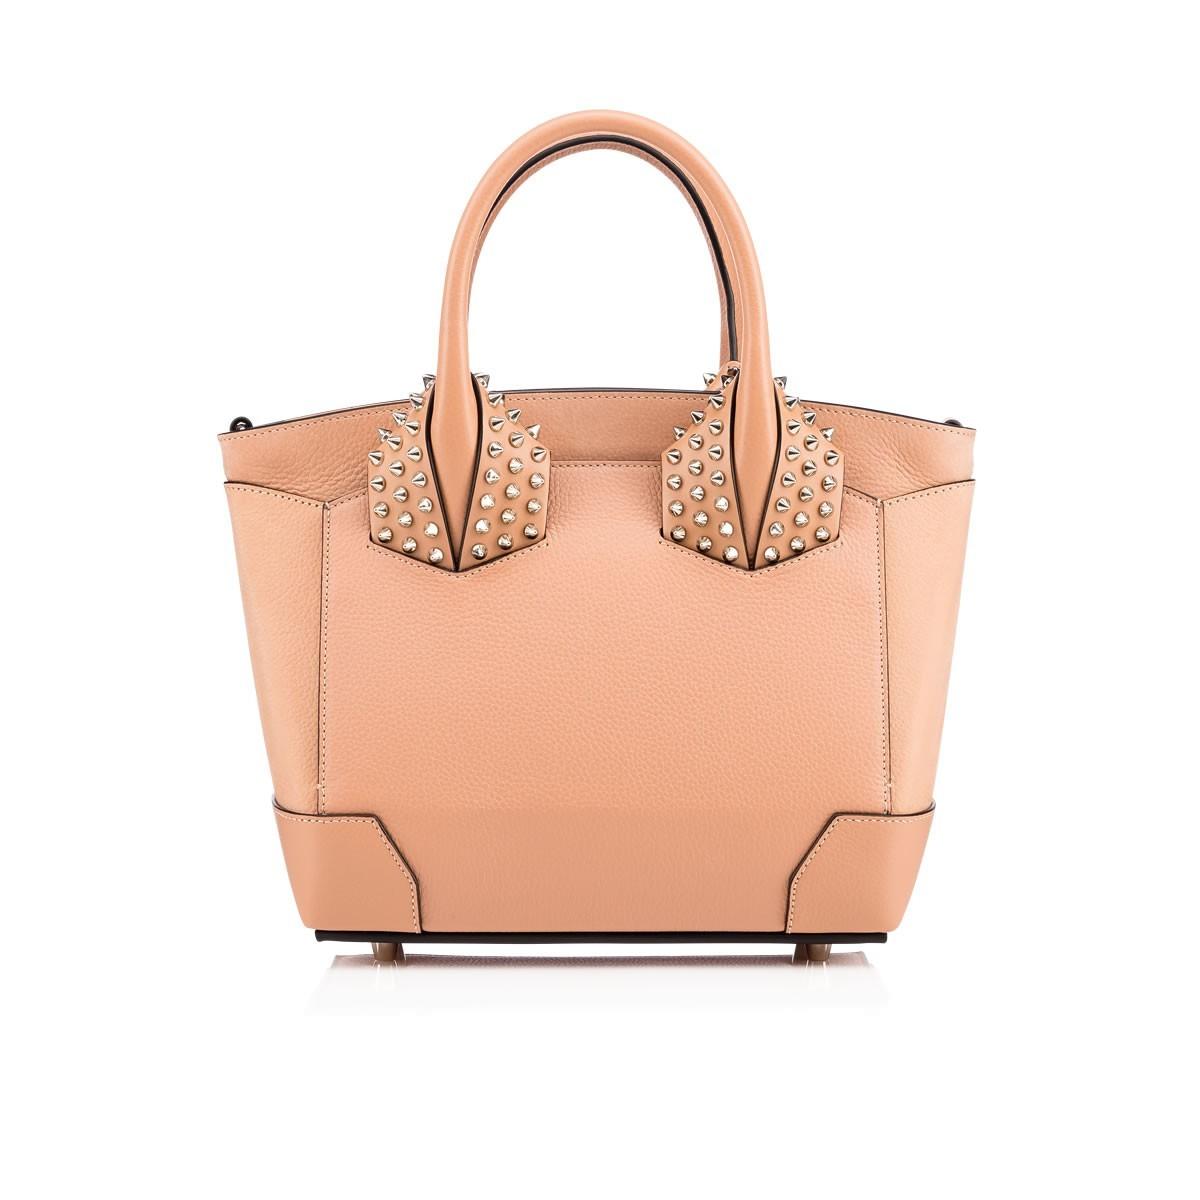 Foto de El nuevo 'it bag' de Christian Louboutin se llama 'Eloise' (8/8)